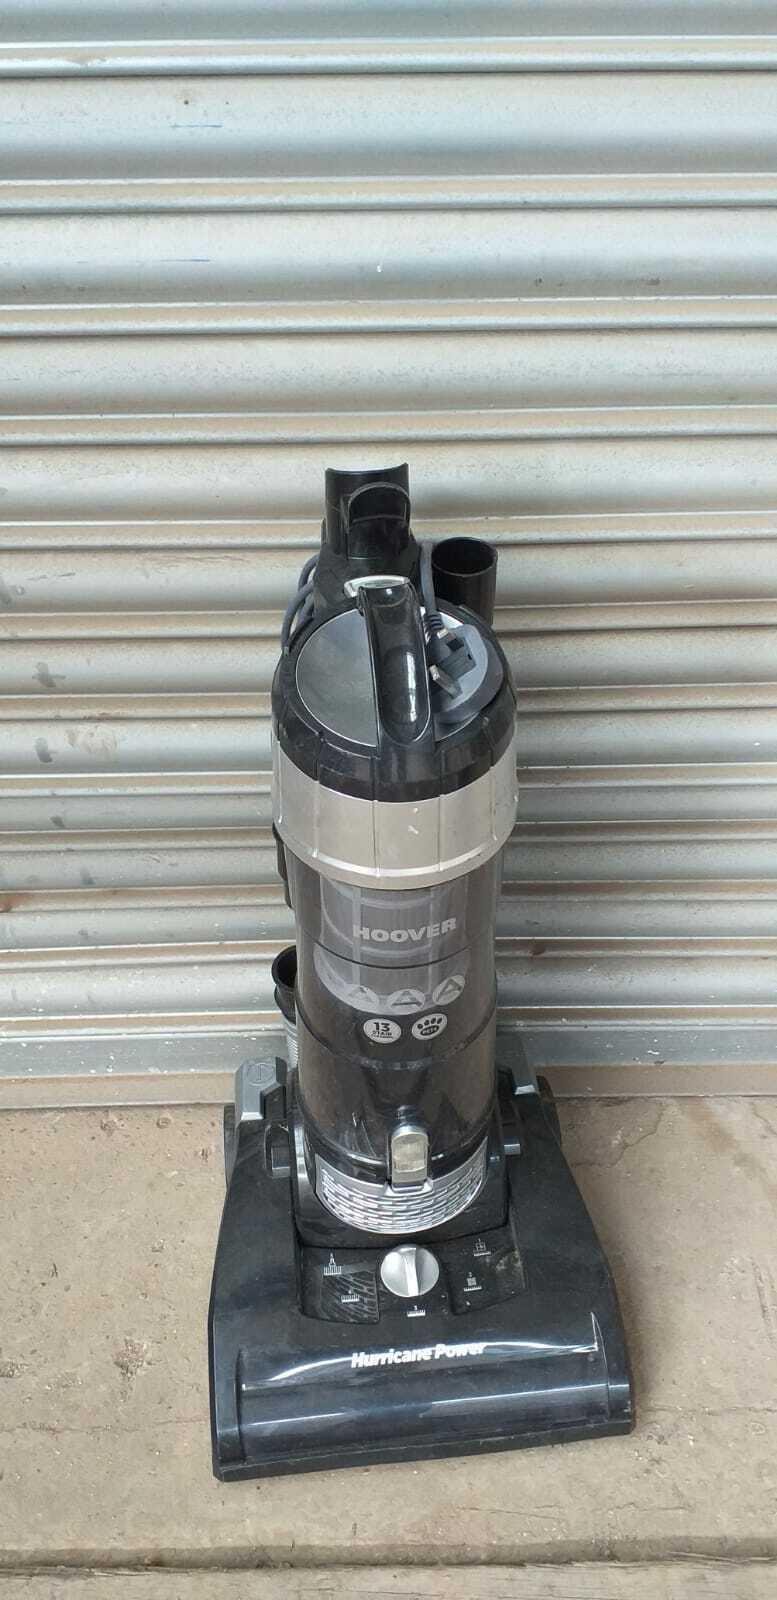 Hoover TH31VO01 Vortex Evo Bagless Upright Vacuum Cleaner